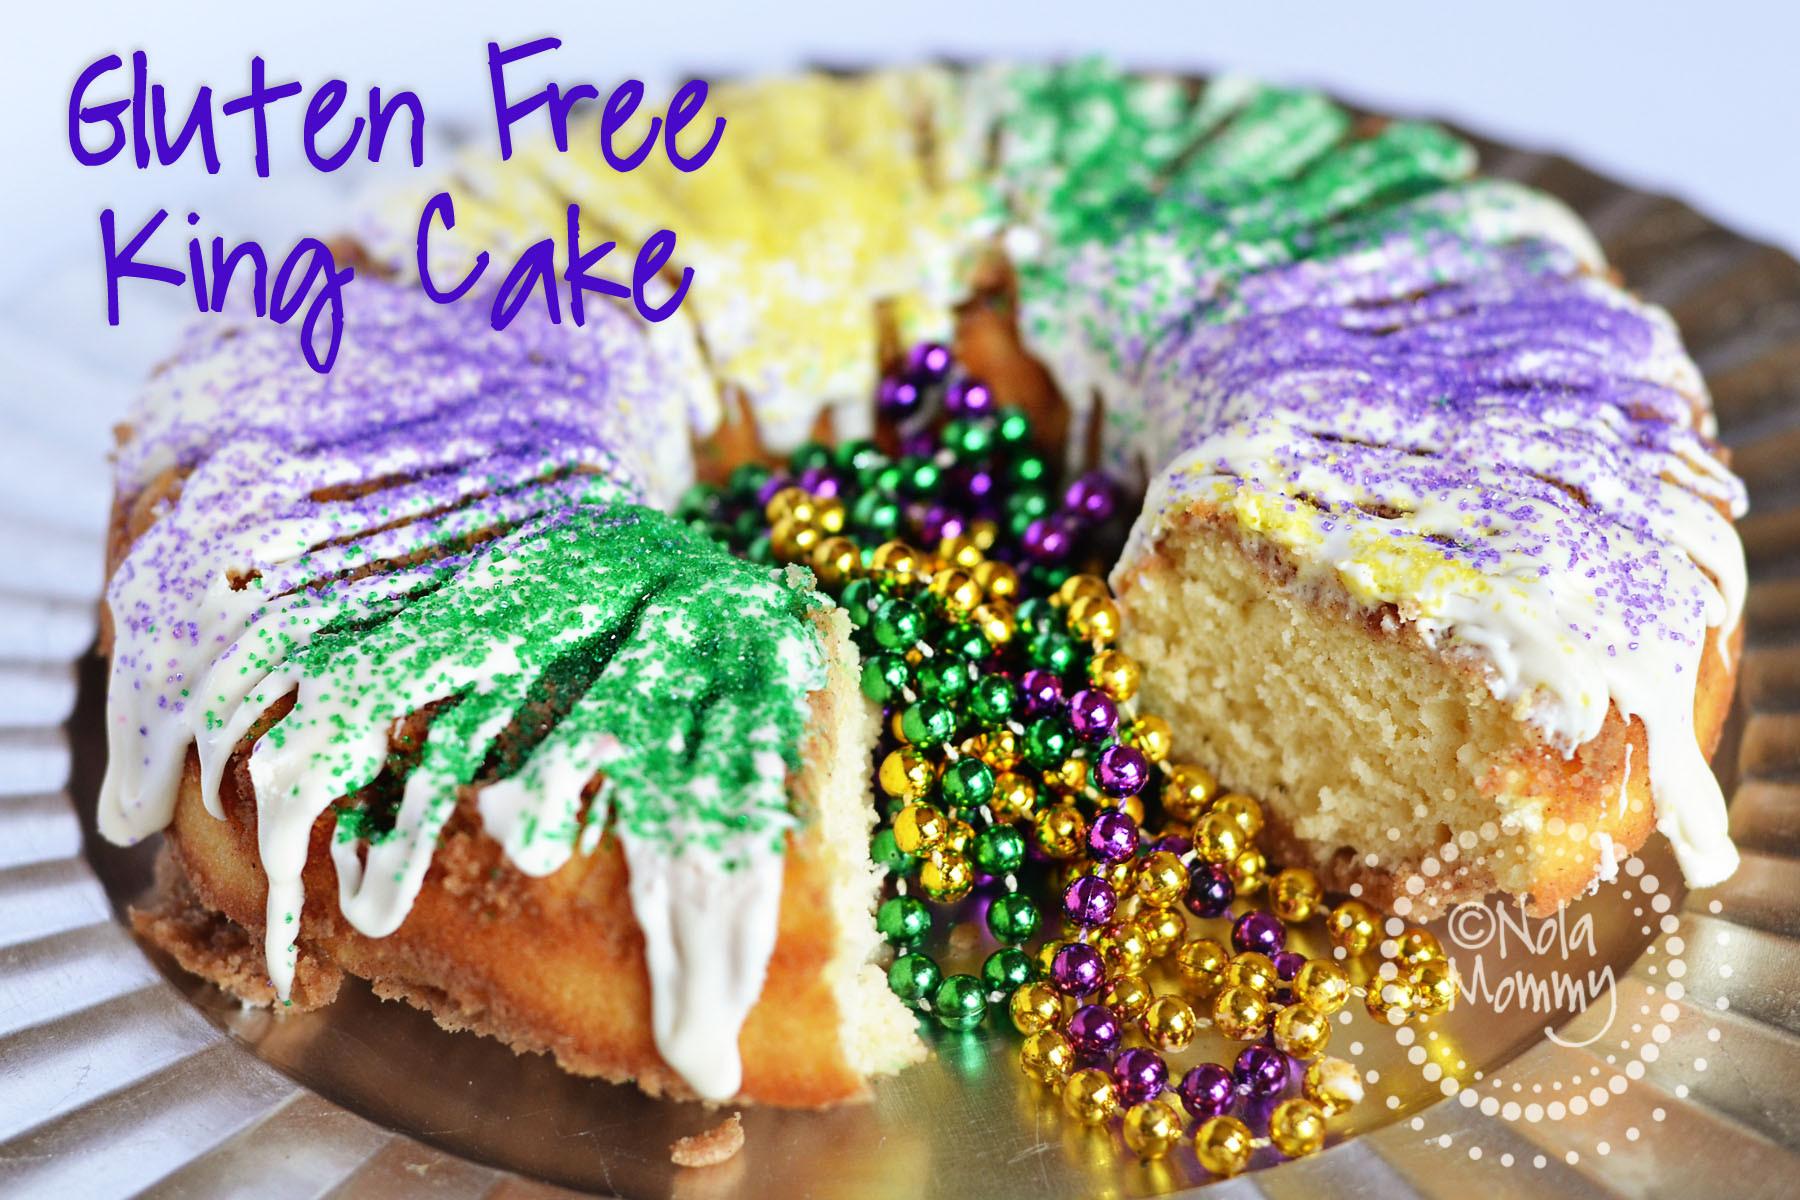 Mardi Gras King Cake Recipe  Gluten Free King Cake Recipe NOLA Mommy